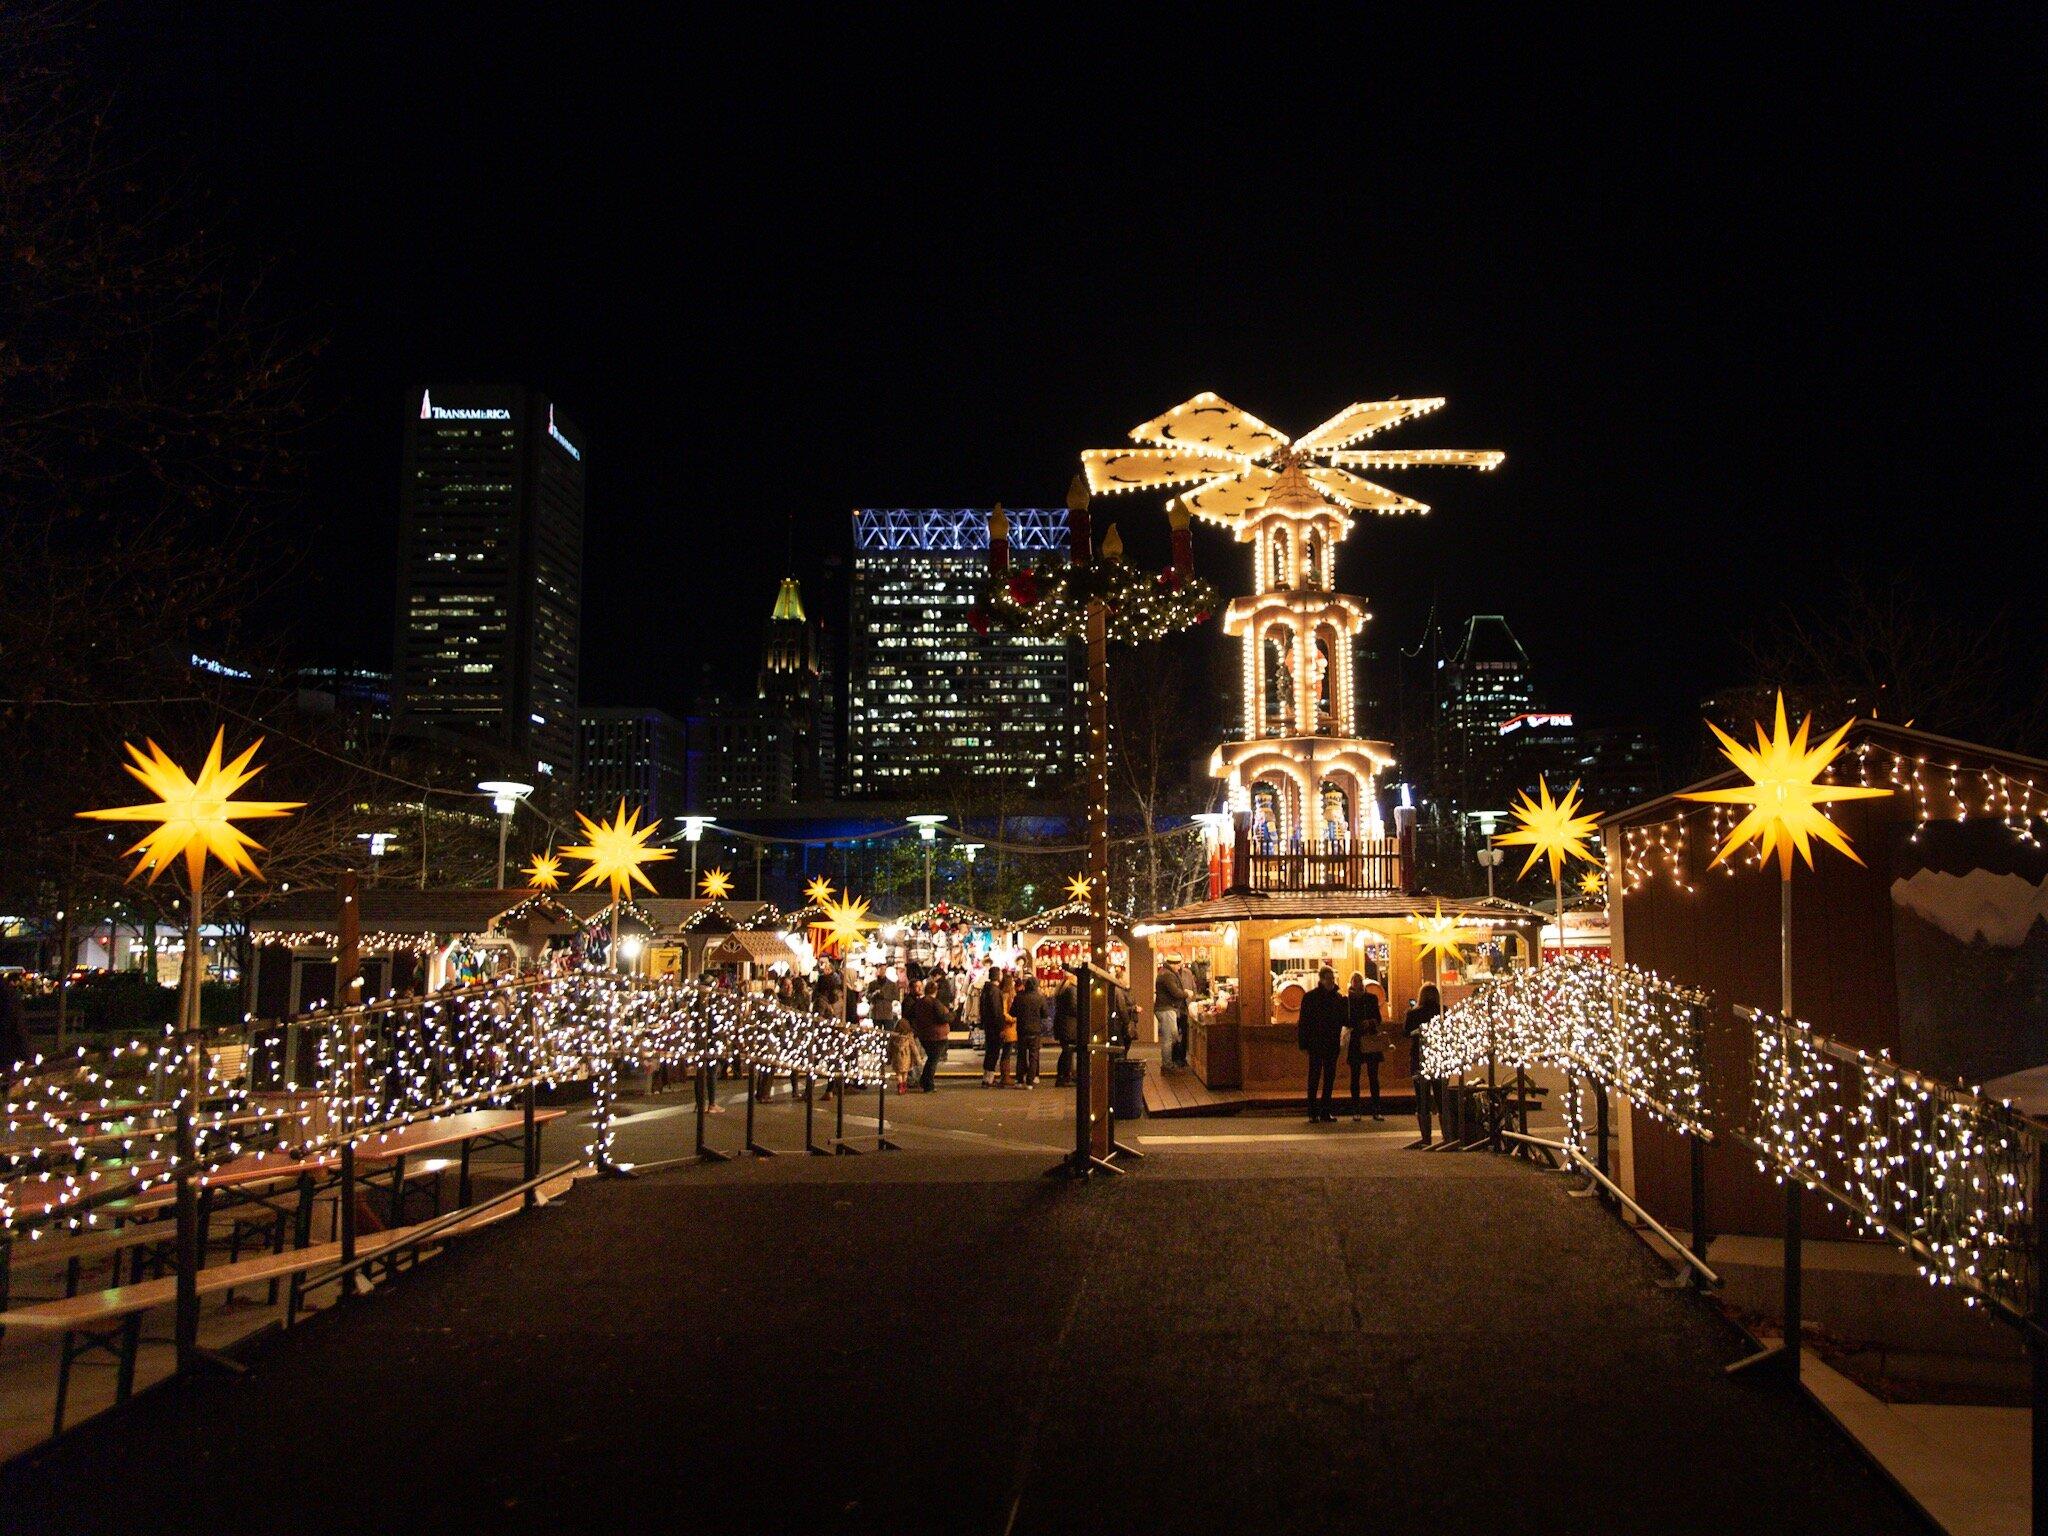 Baltimore Christmas 2021 Christmas Village In Baltimore Postpones In Person Season At Inner Harbor Until 2021 Aversa Pr Events Philadelphia Public Relations